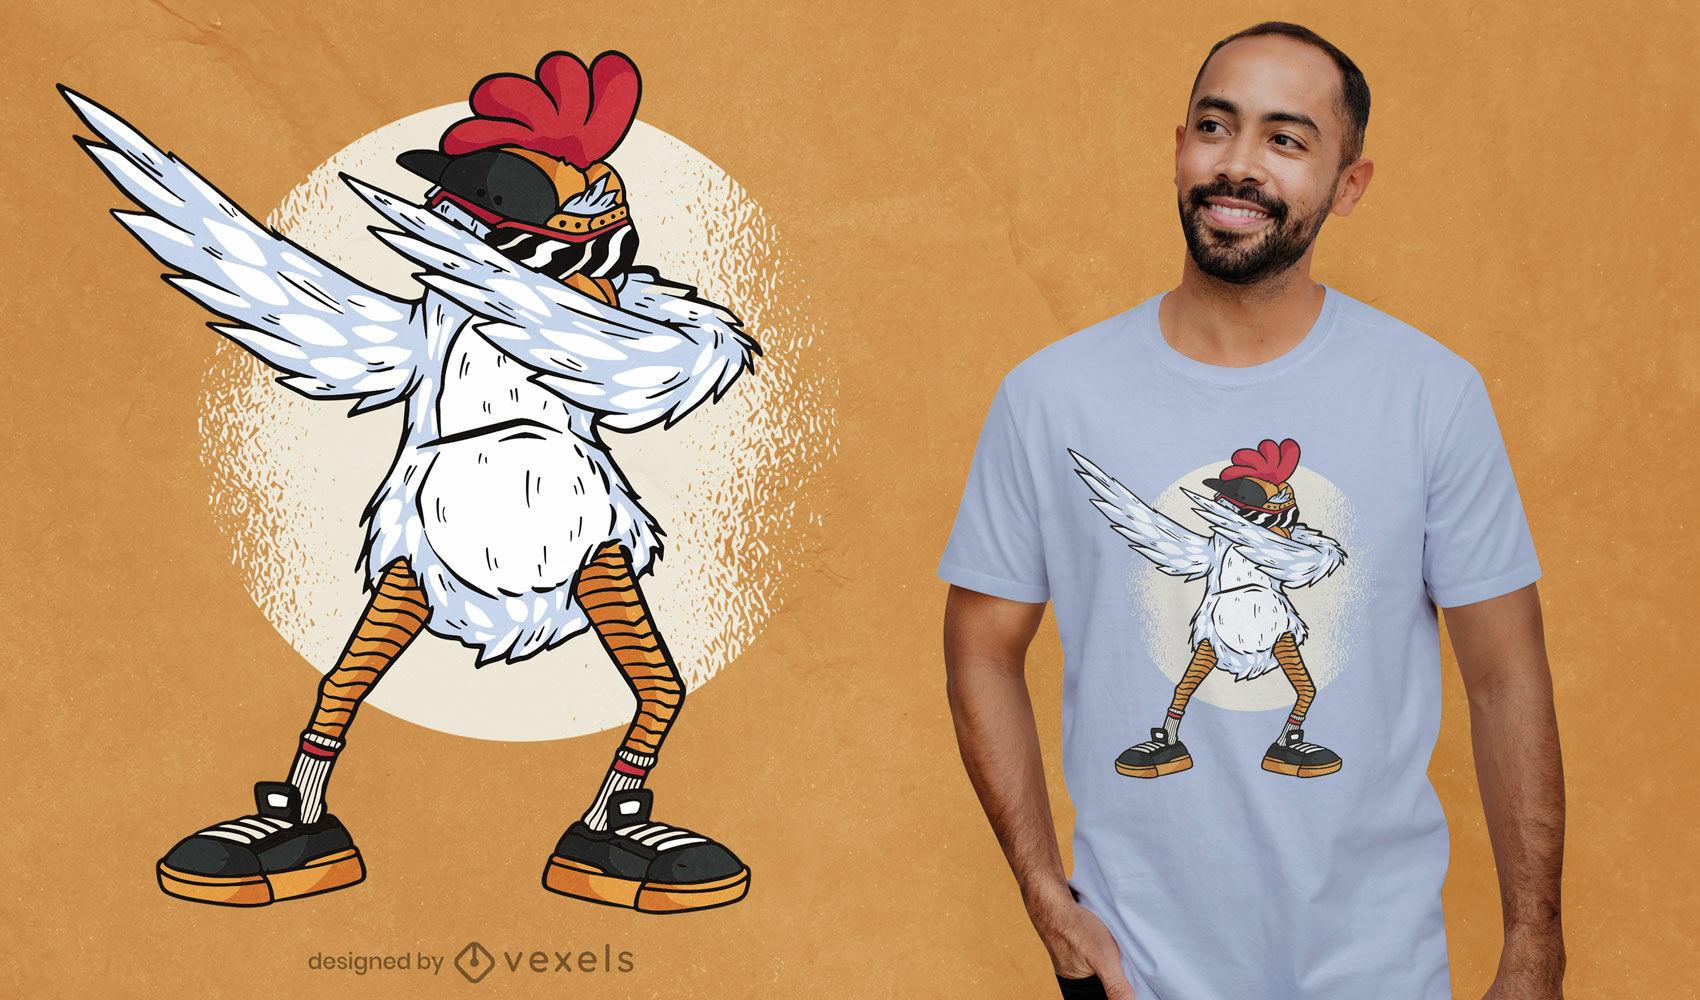 Cool chicken dabbing t-shirt design